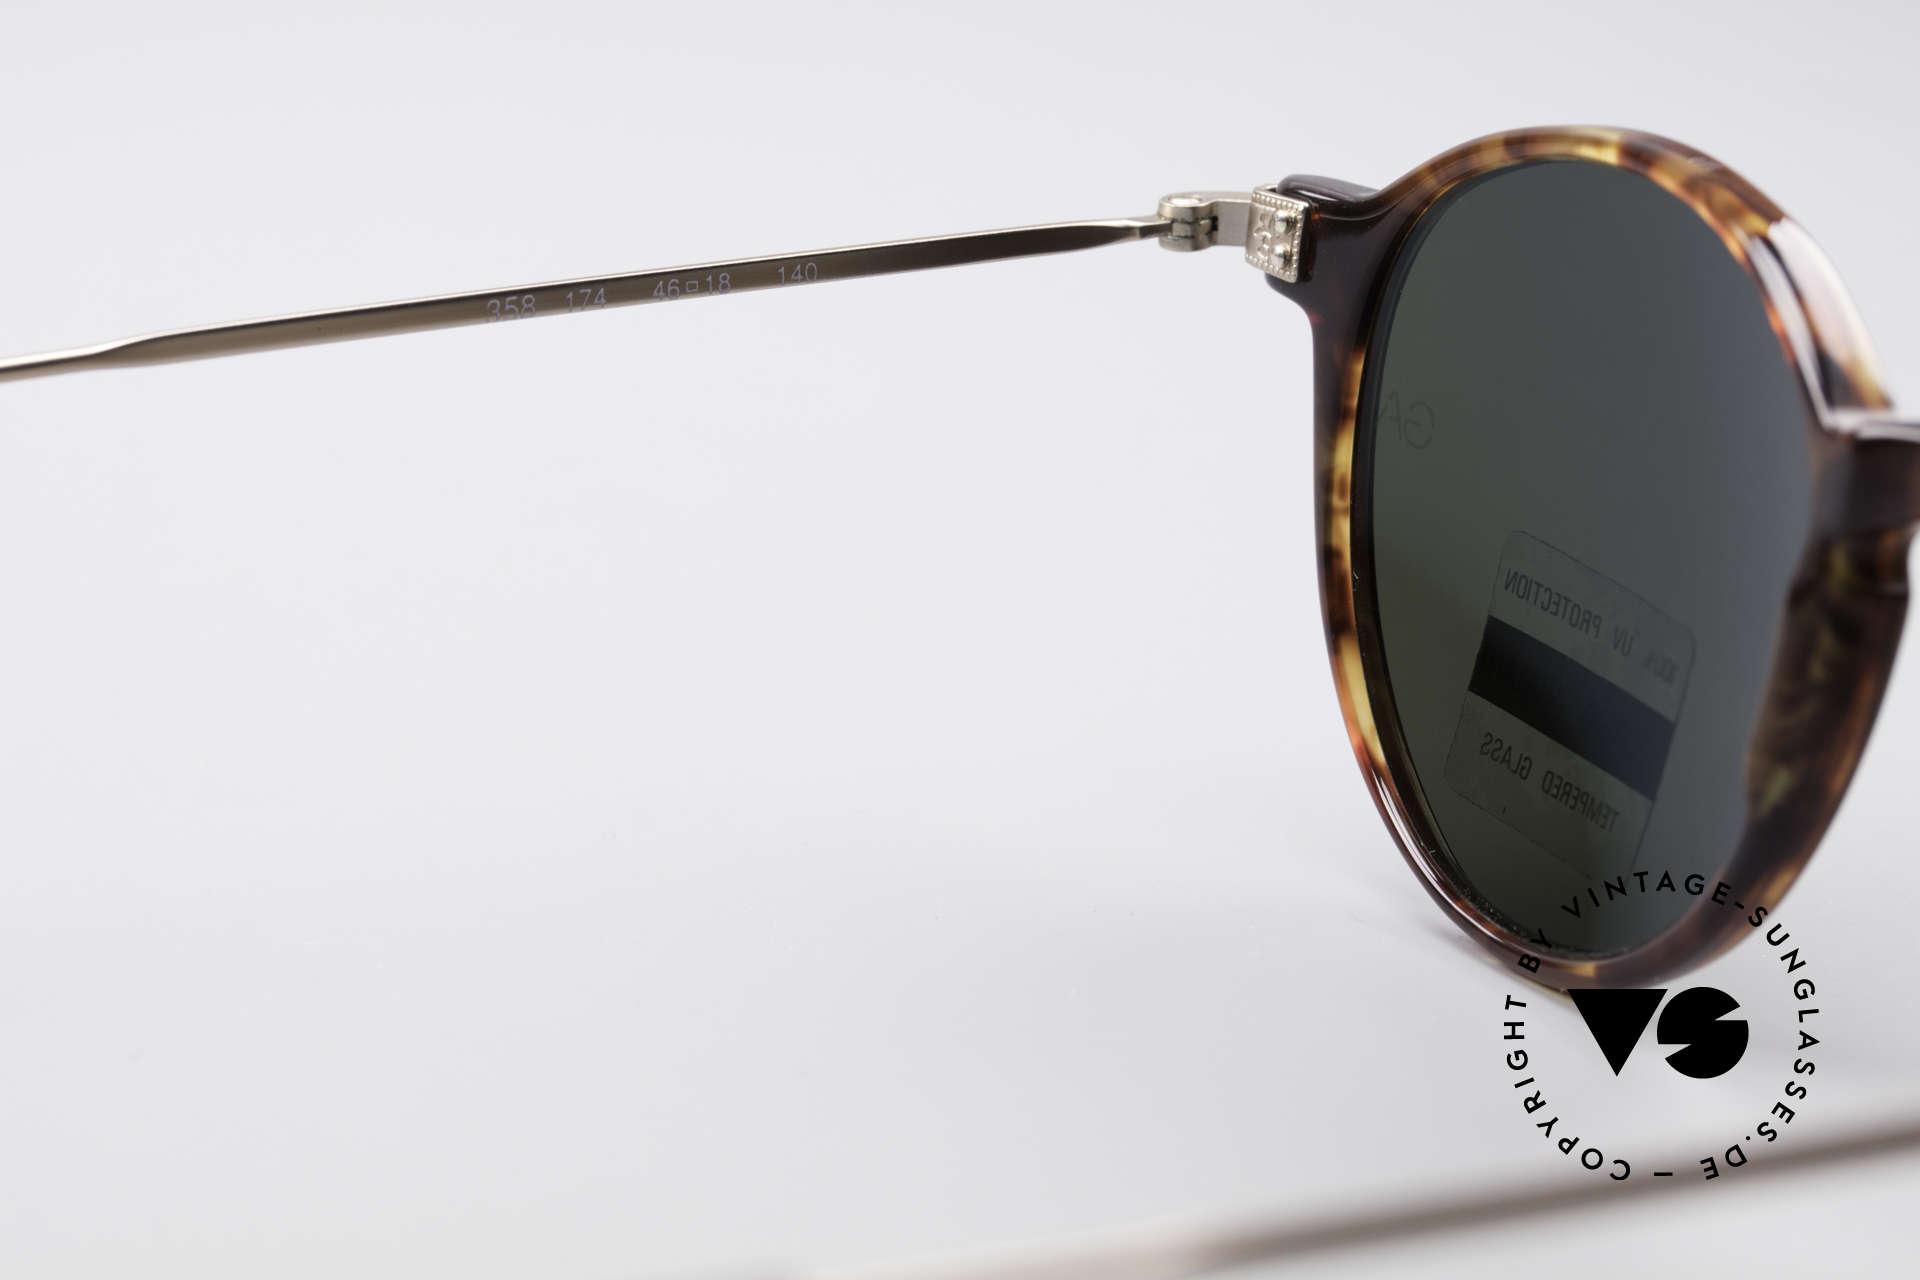 Giorgio Armani 358 Vintage Panto Sunglasses, NO retro specs, but an unique 30 years old ORIGINAL!, Made for Men